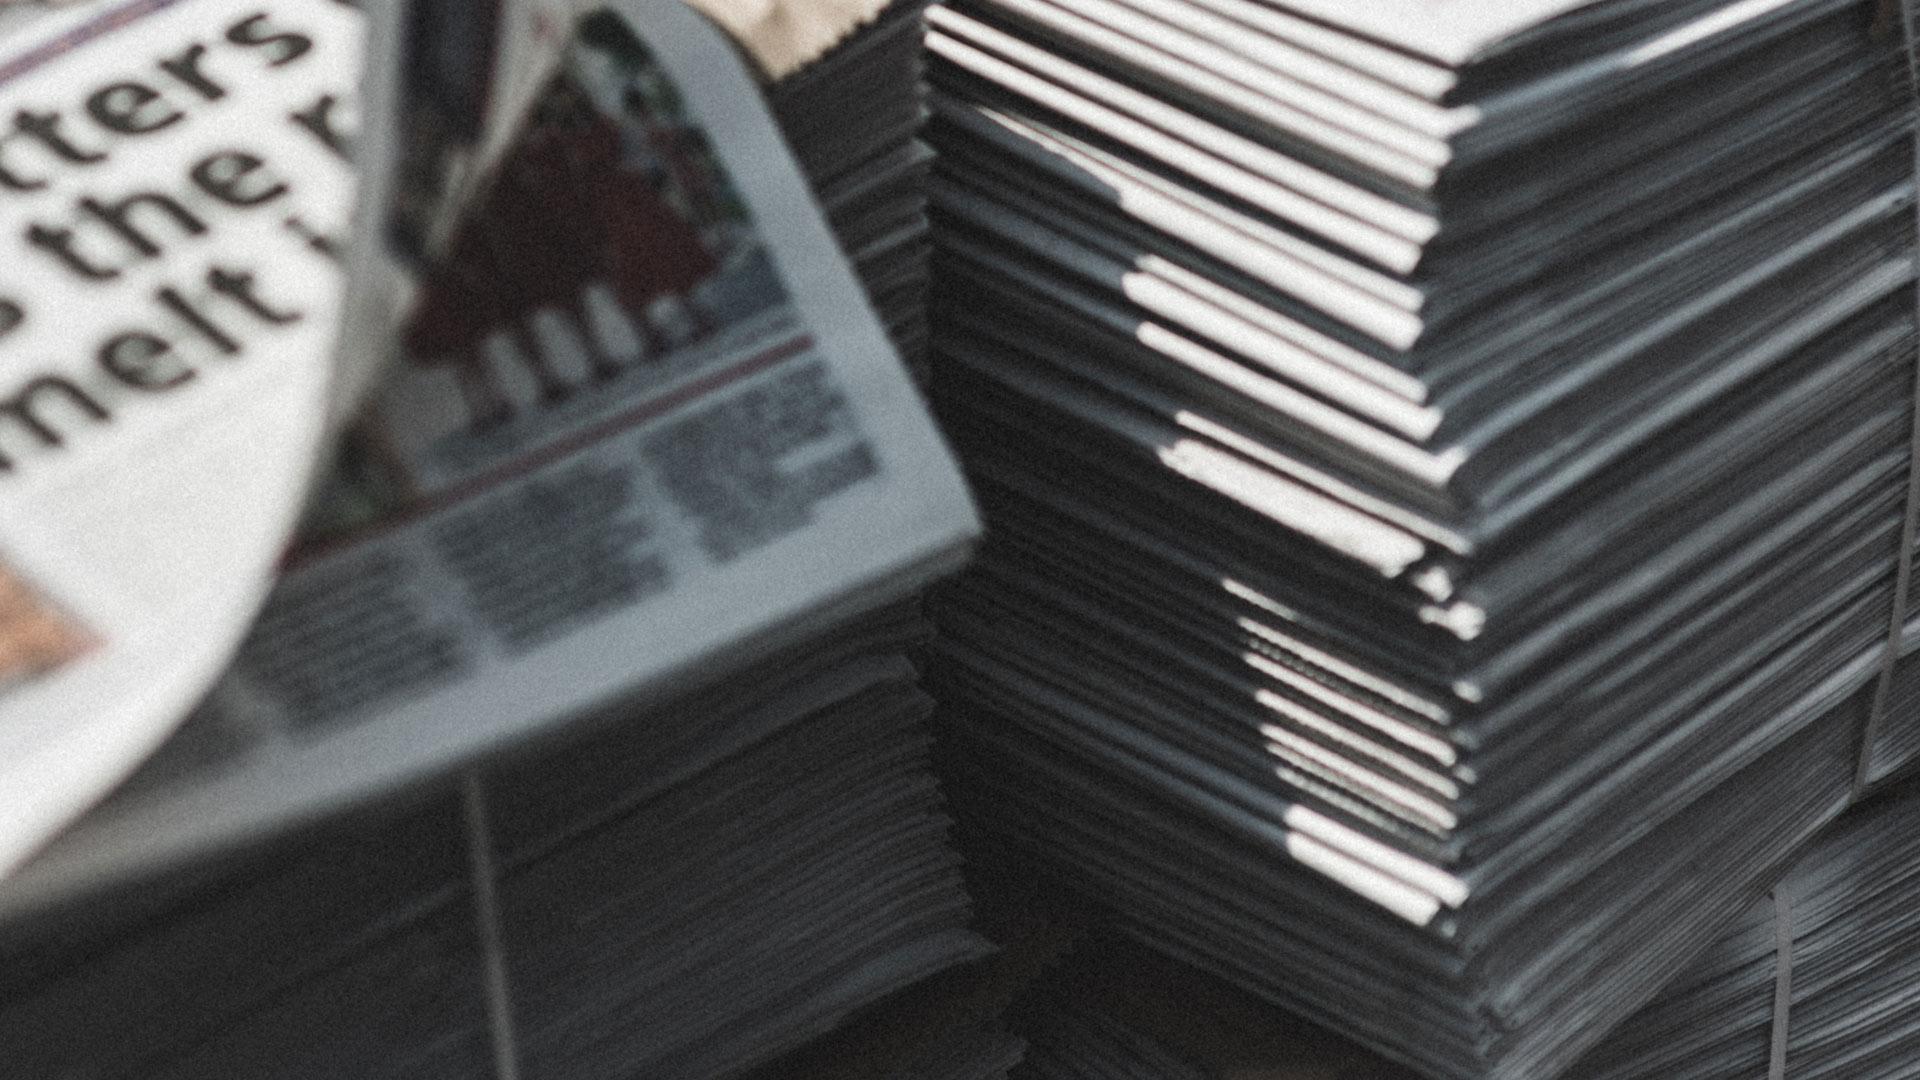 Stacks of newspapers